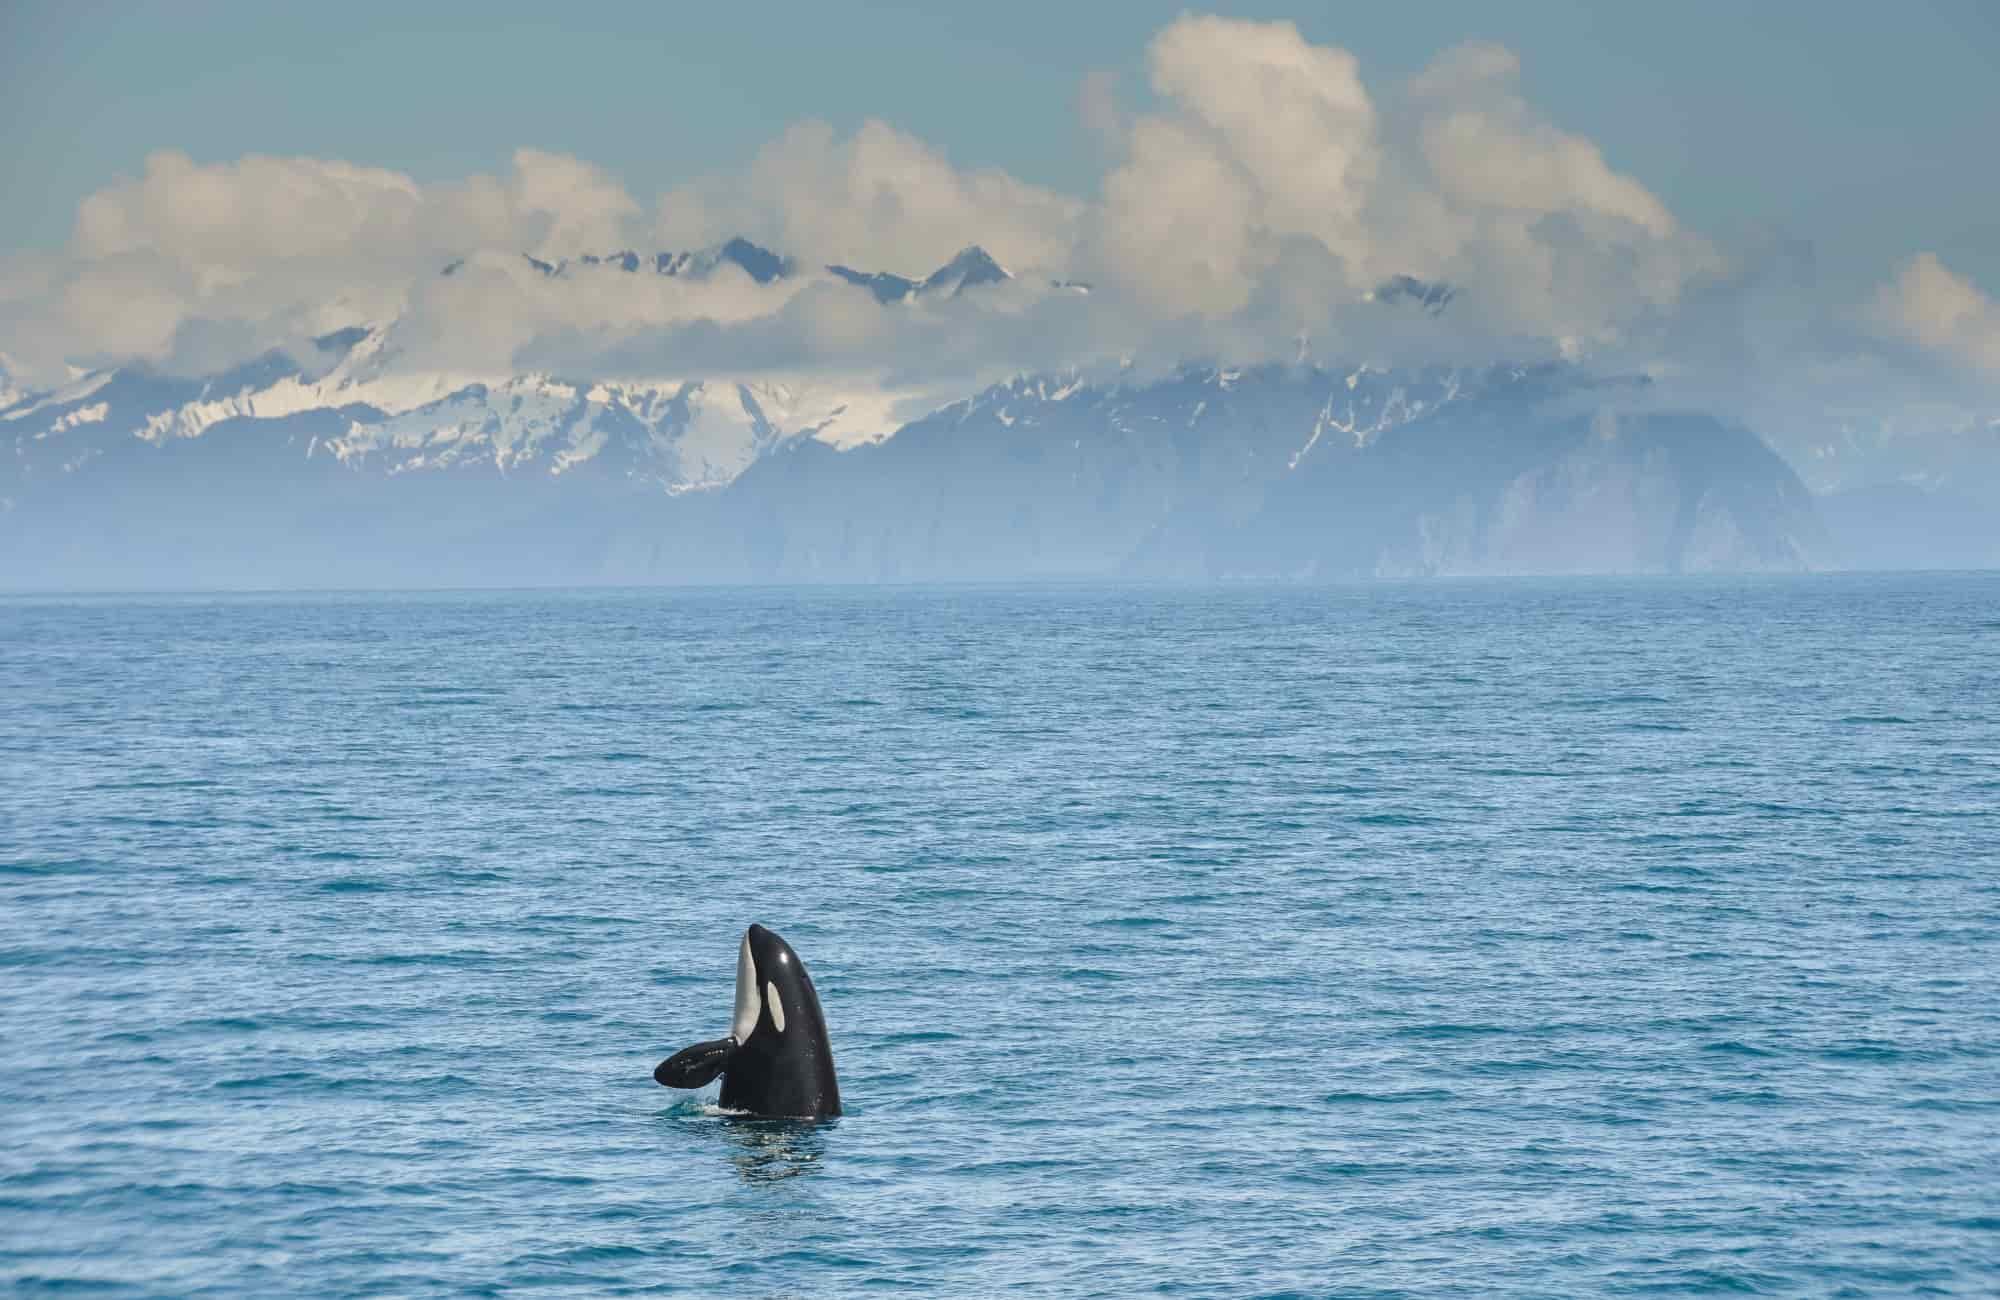 Voyage Eutats-Unis - Alaska Kenai Fjords National Park - Amplitudes